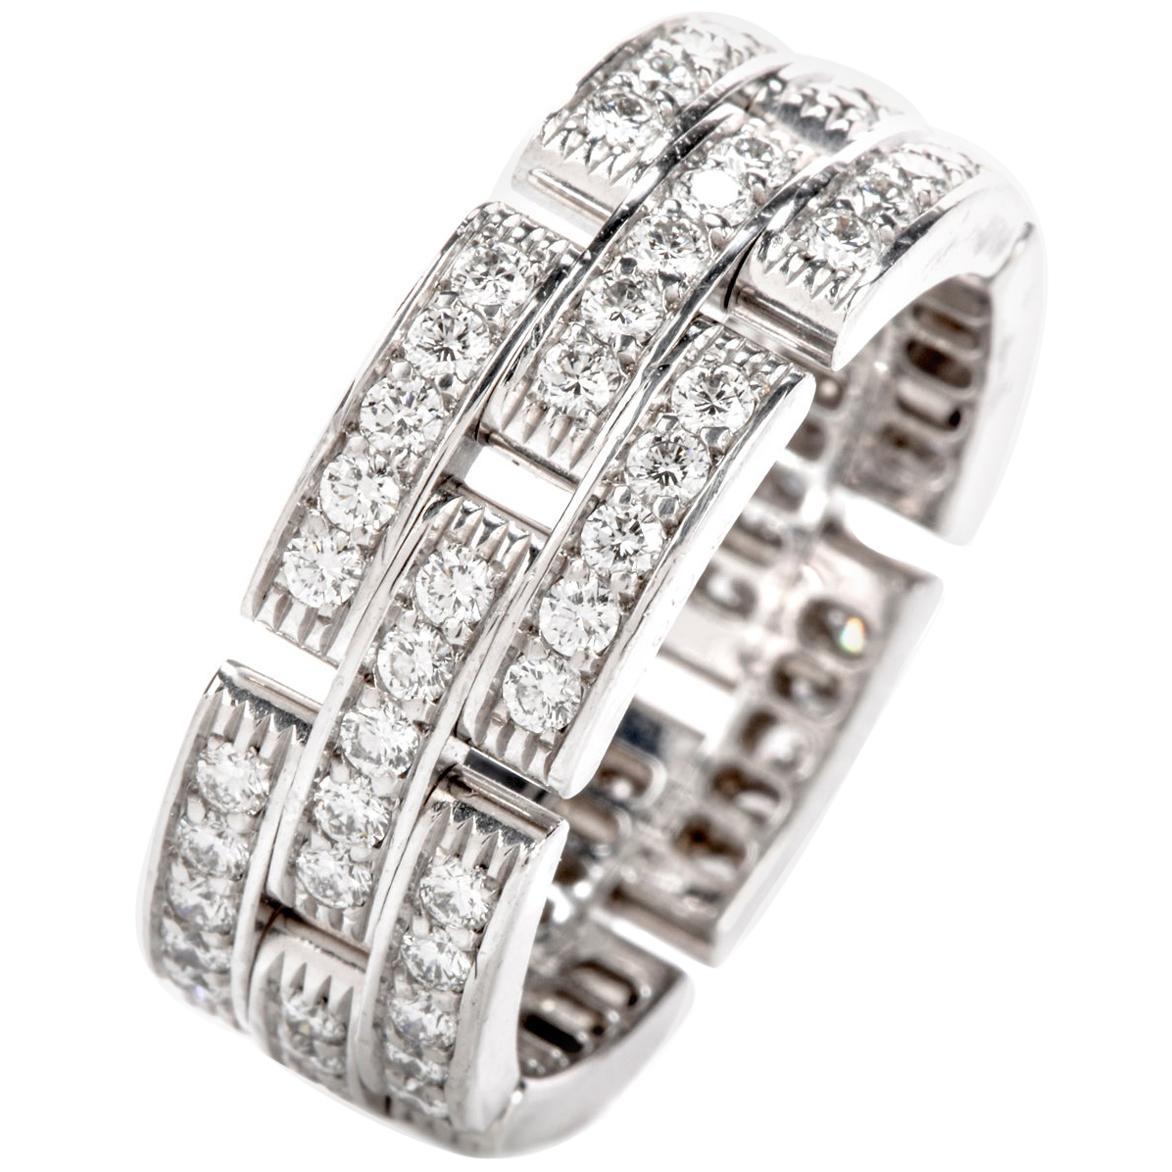 Cartier Maillon Panthère Diamond 18 Karat Gold Link Unisex Band Ring